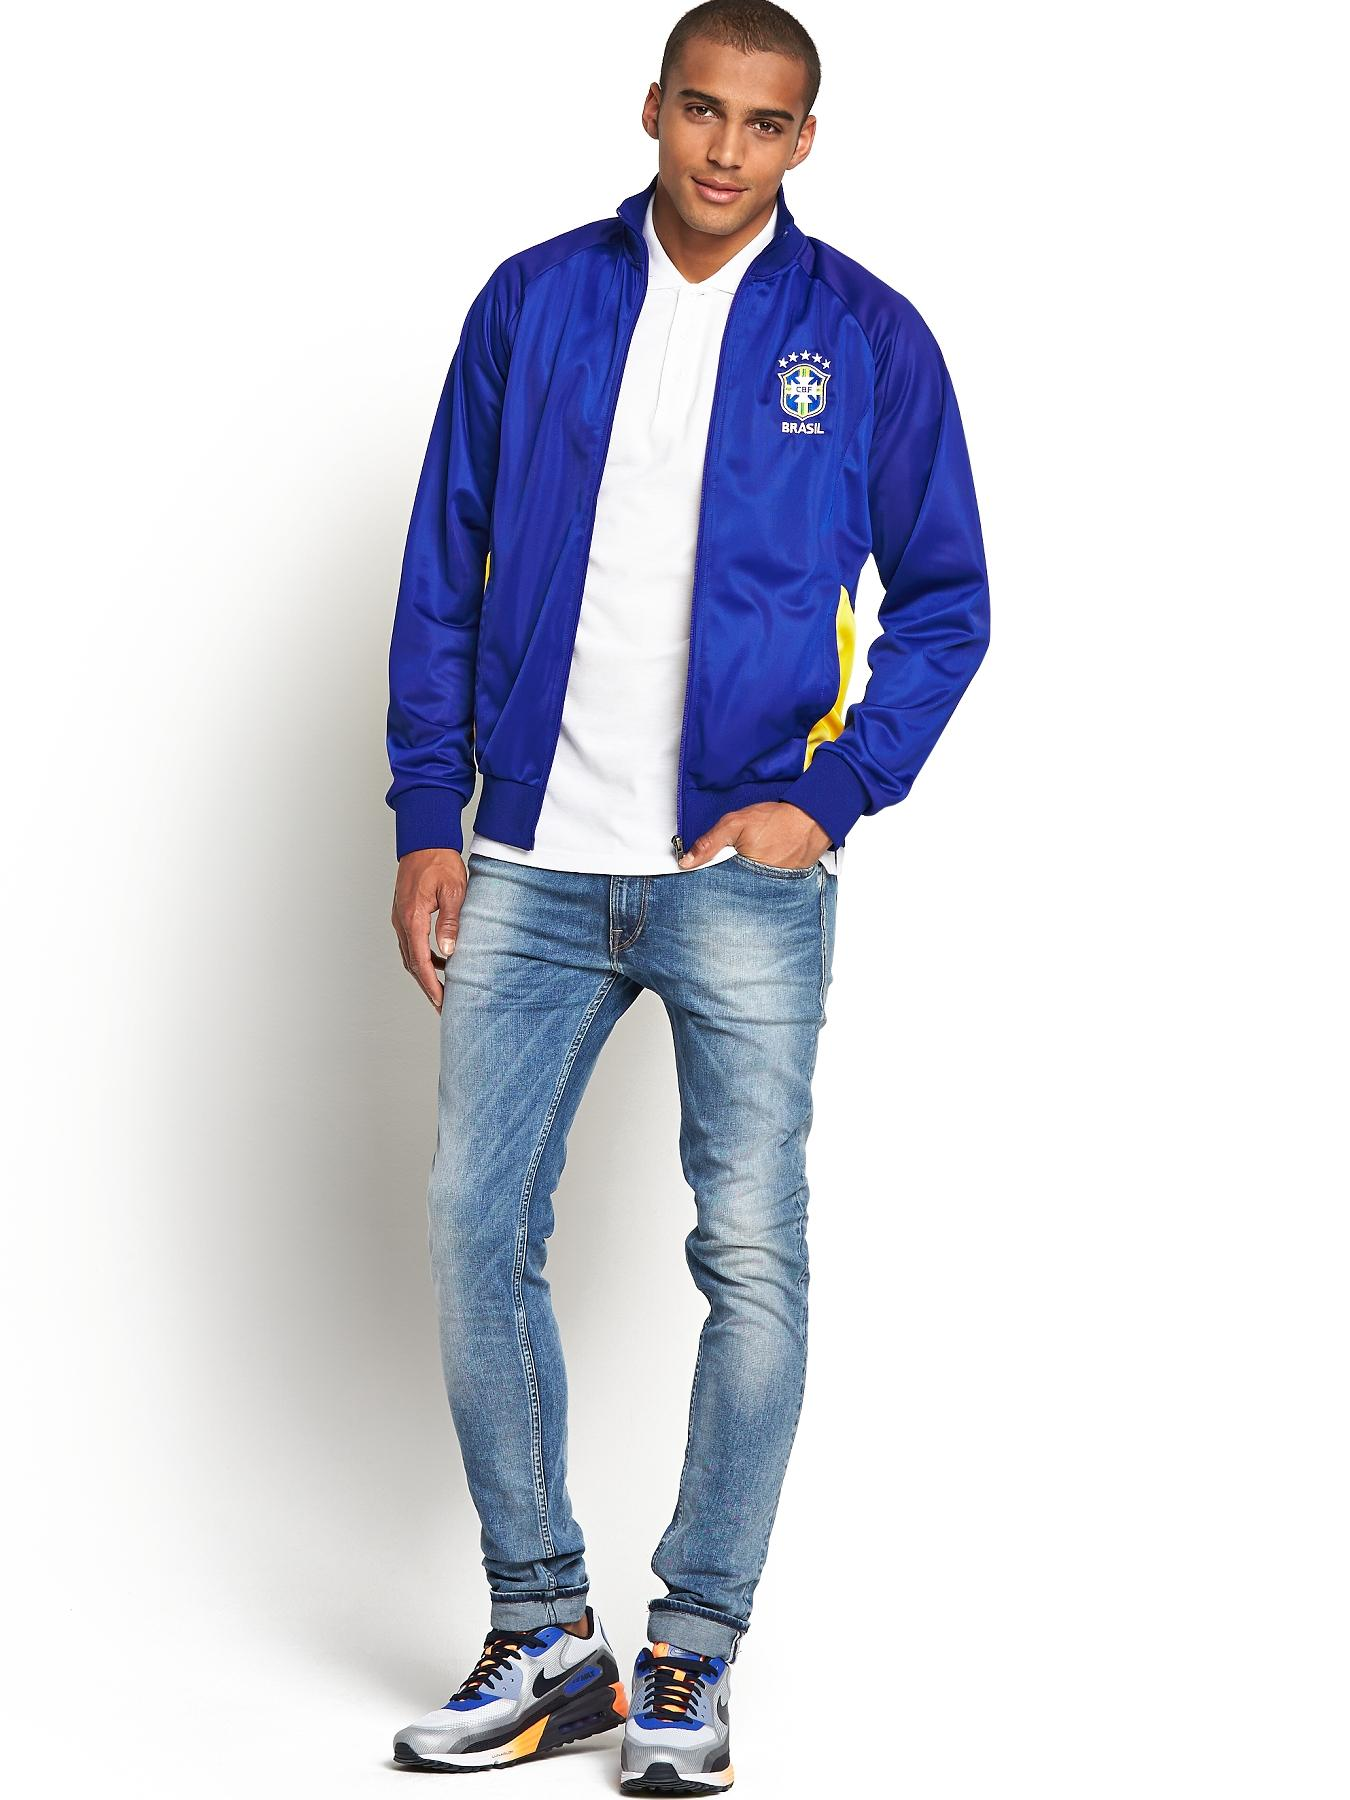 brazil-fc-mens-tricot-track-jacketoutfit